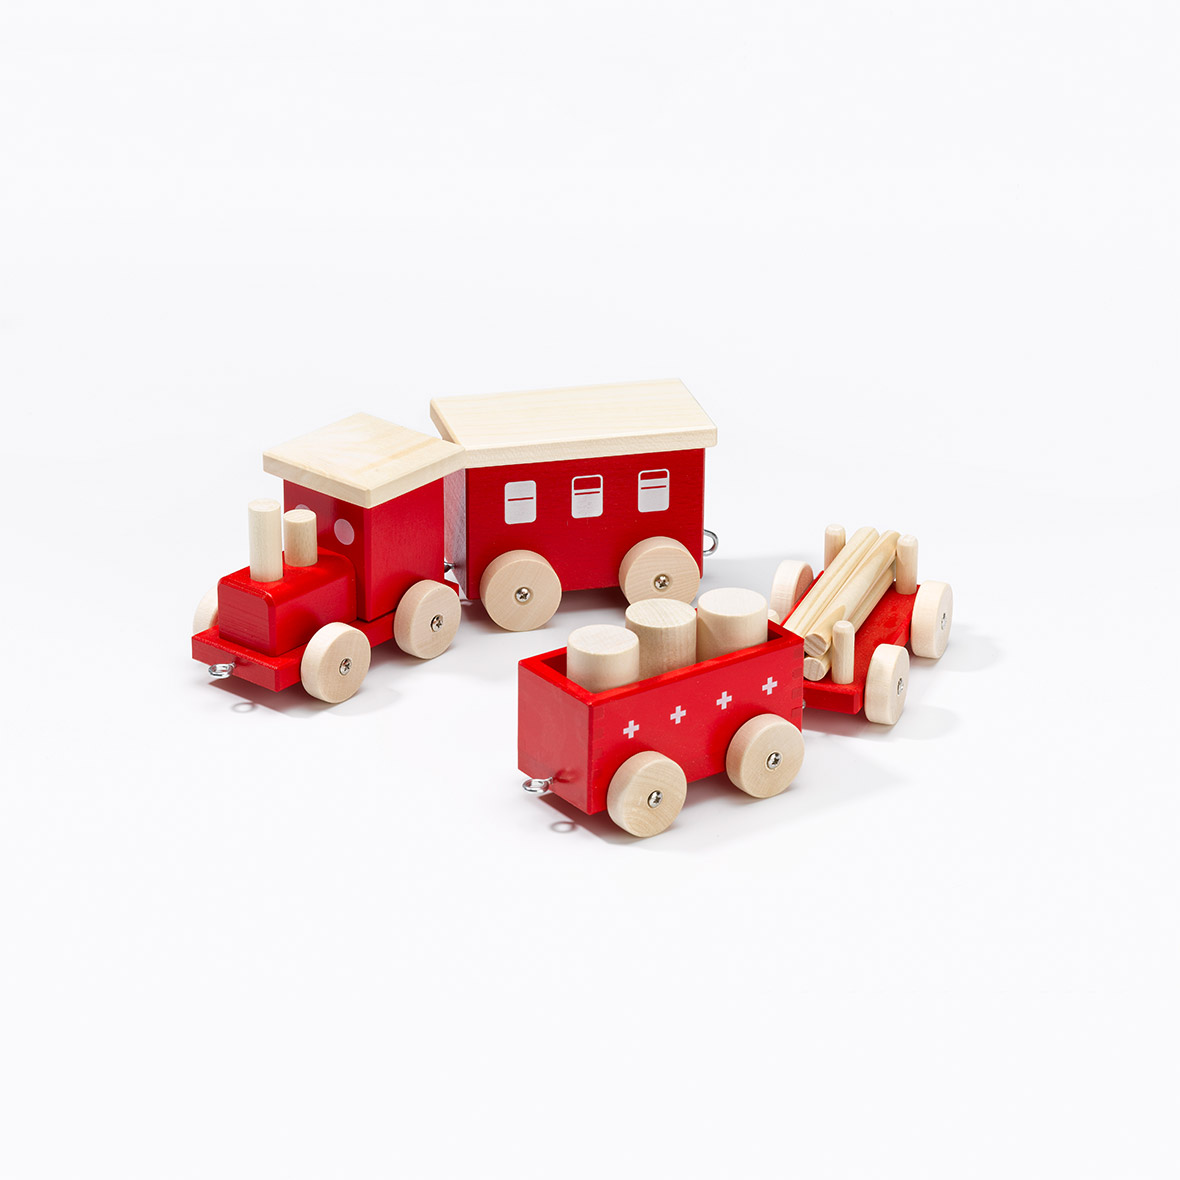 Kinder Holz-Eisenbahn Zügli, rot